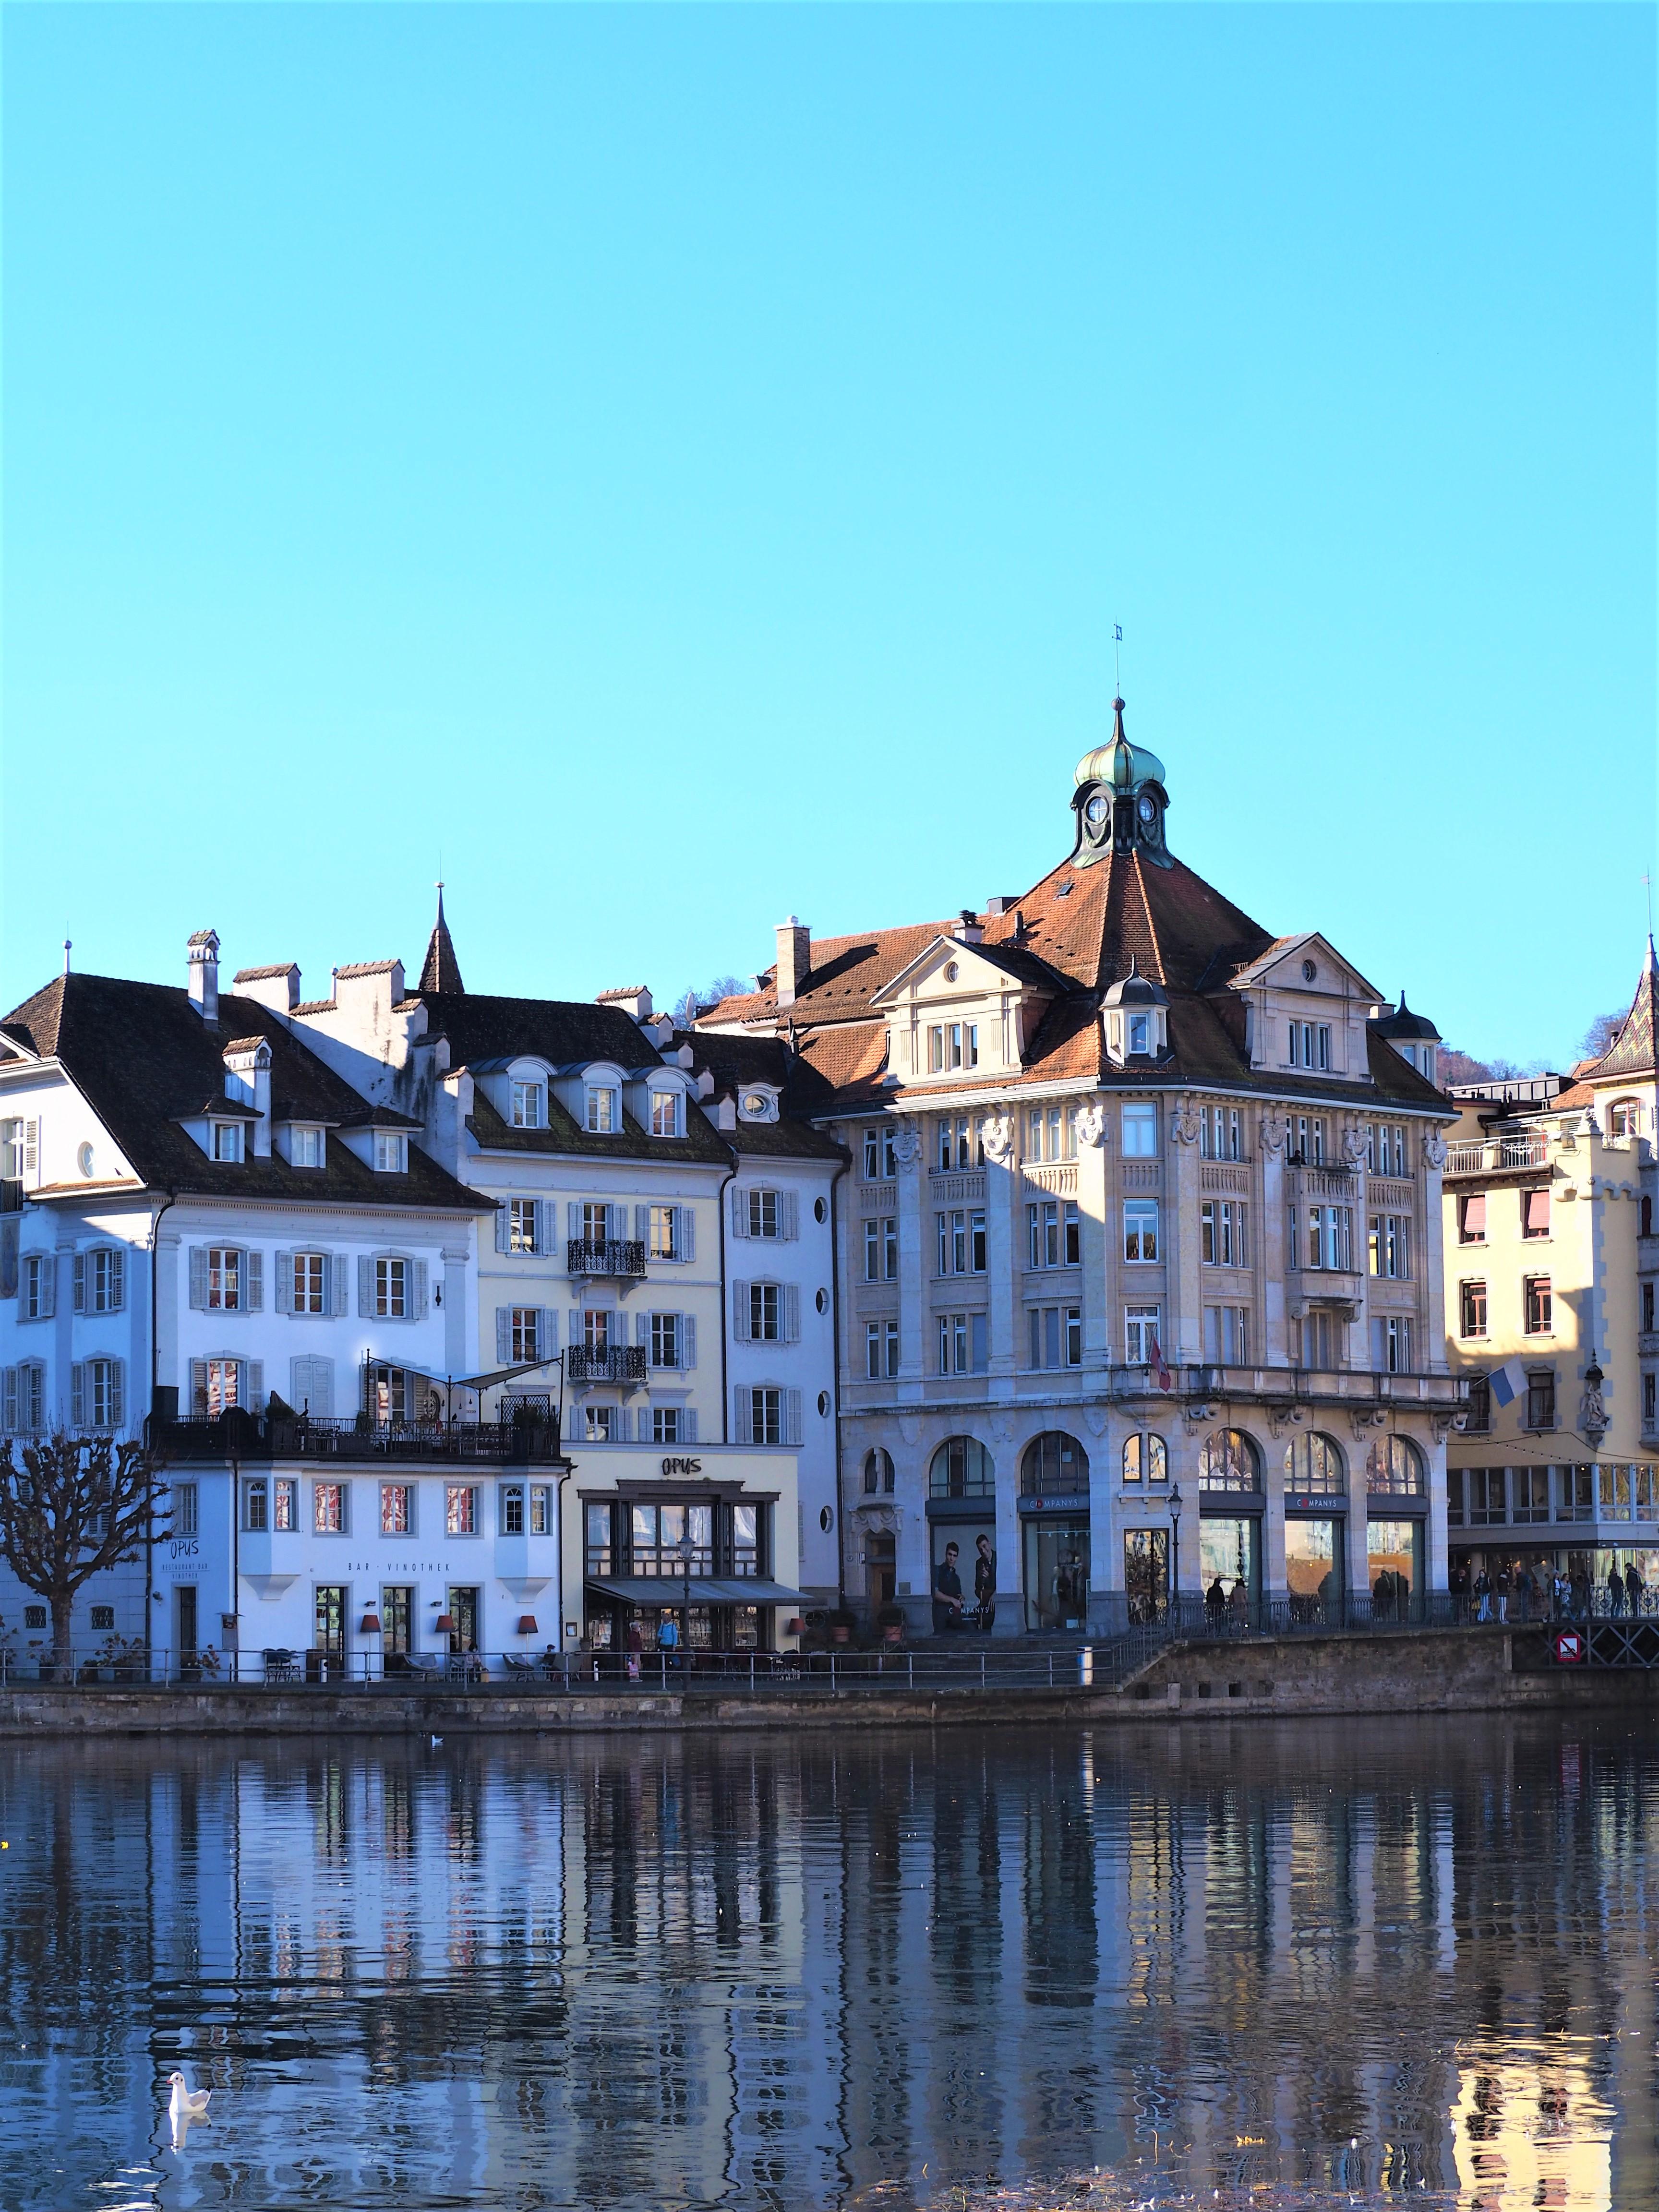 Lucerne-ville-clio-co-blog-voyage-suisse.